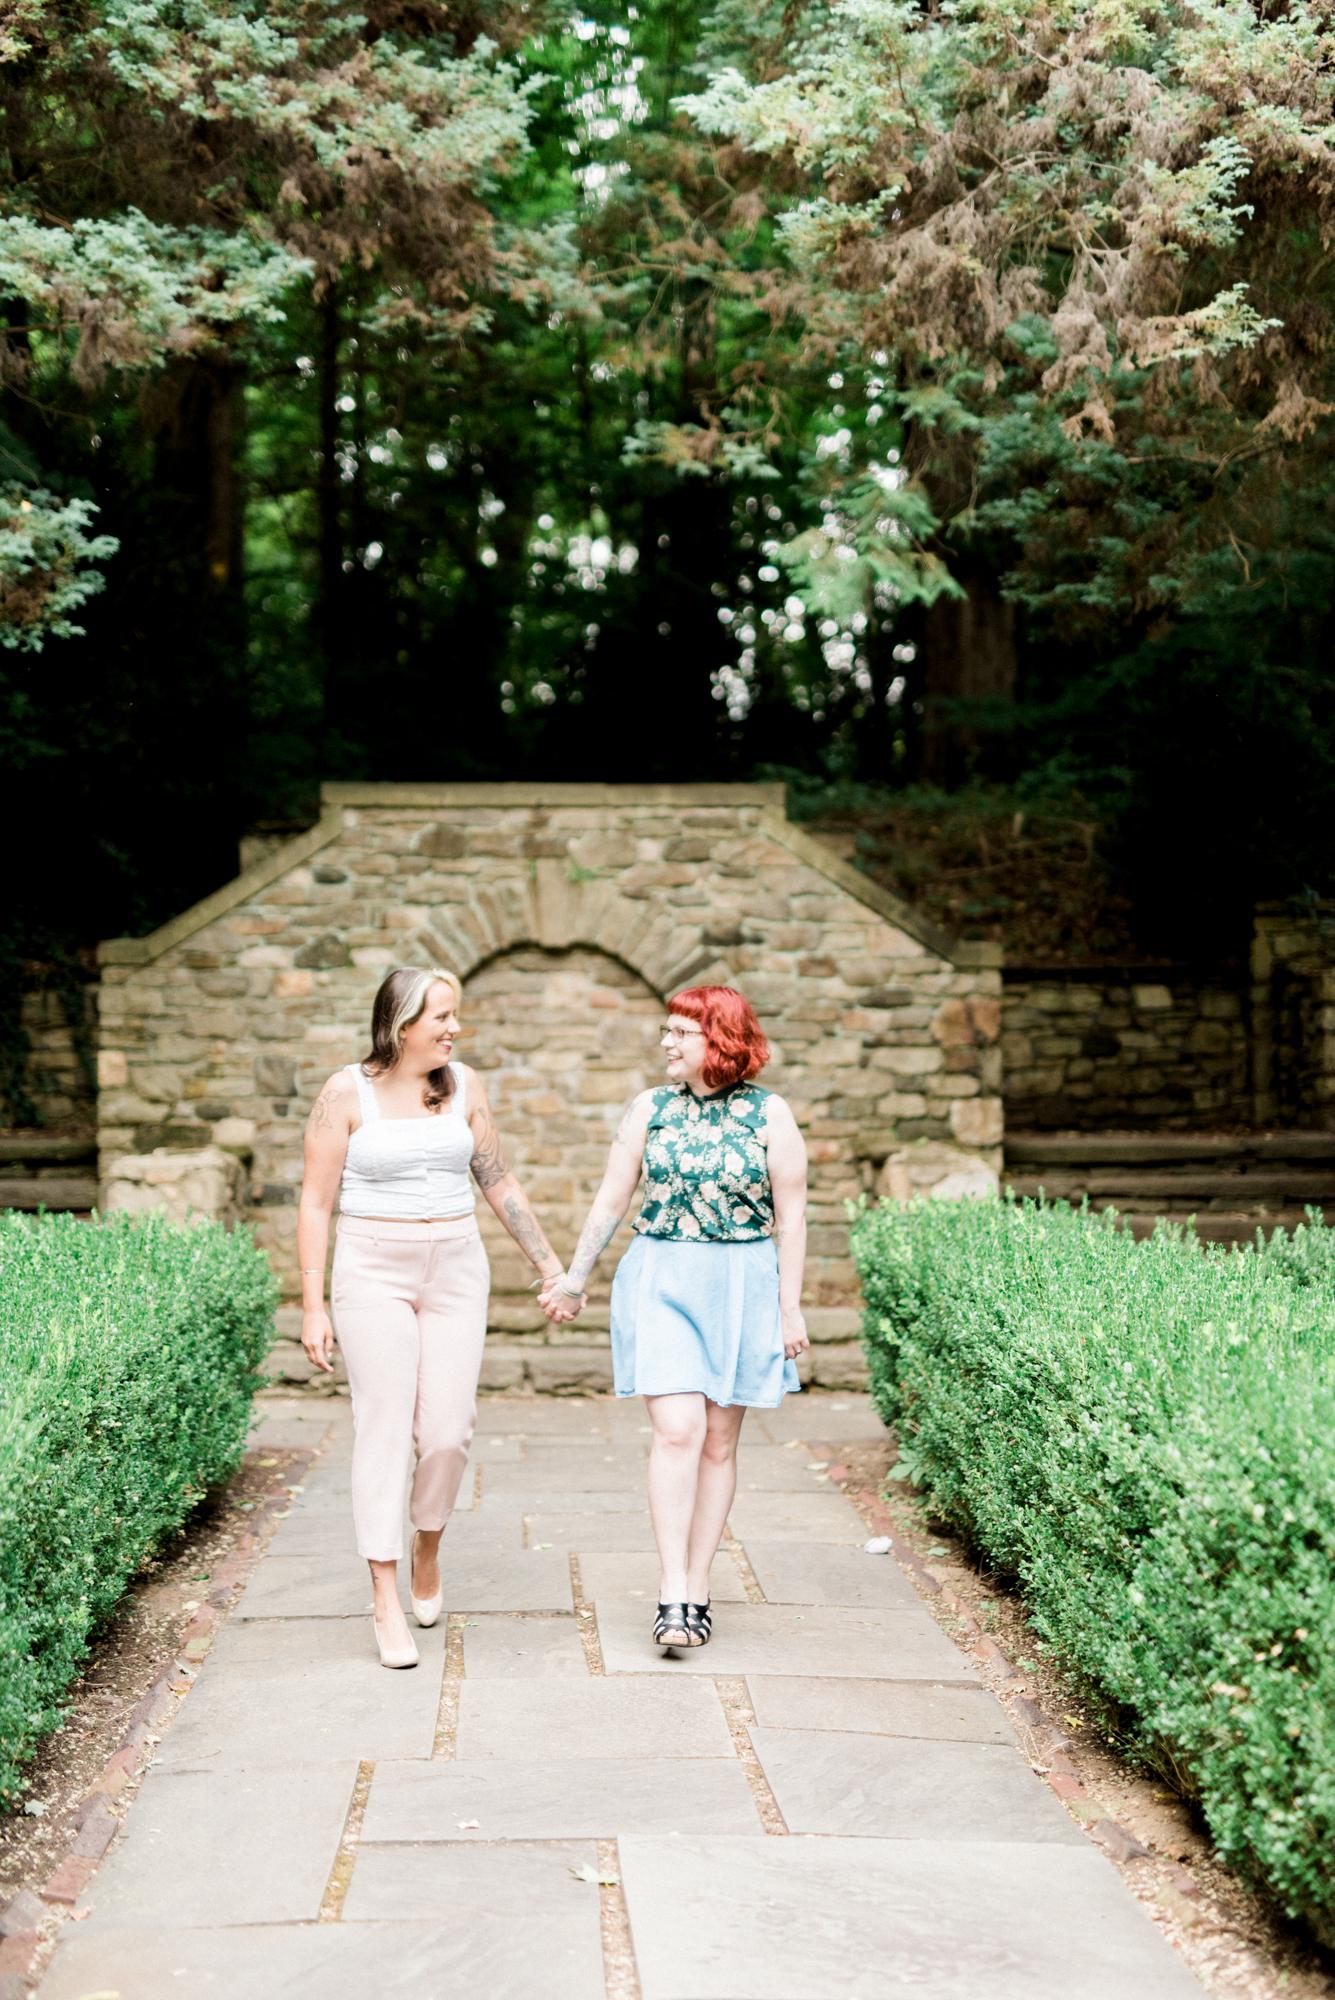 same-sex-enagagement-session-ridley-creek-state-park-haley-richter-photography-001.jpg